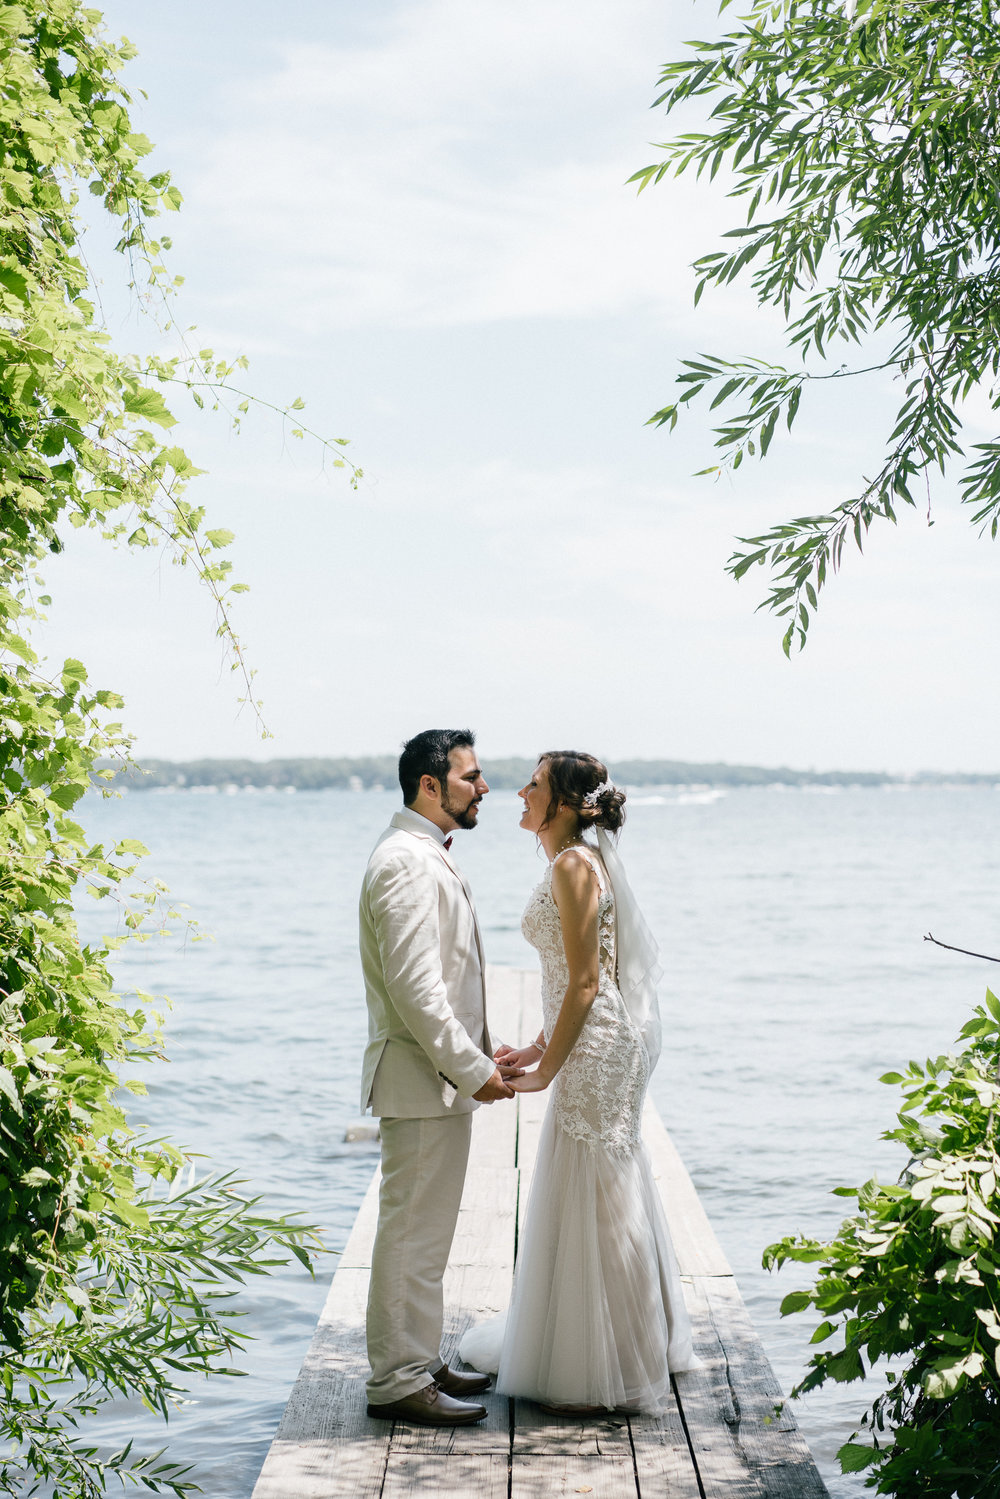 Gull Point State Park, Wedding, Wedding Photos, Photography, wedding photography, iowa, midwest